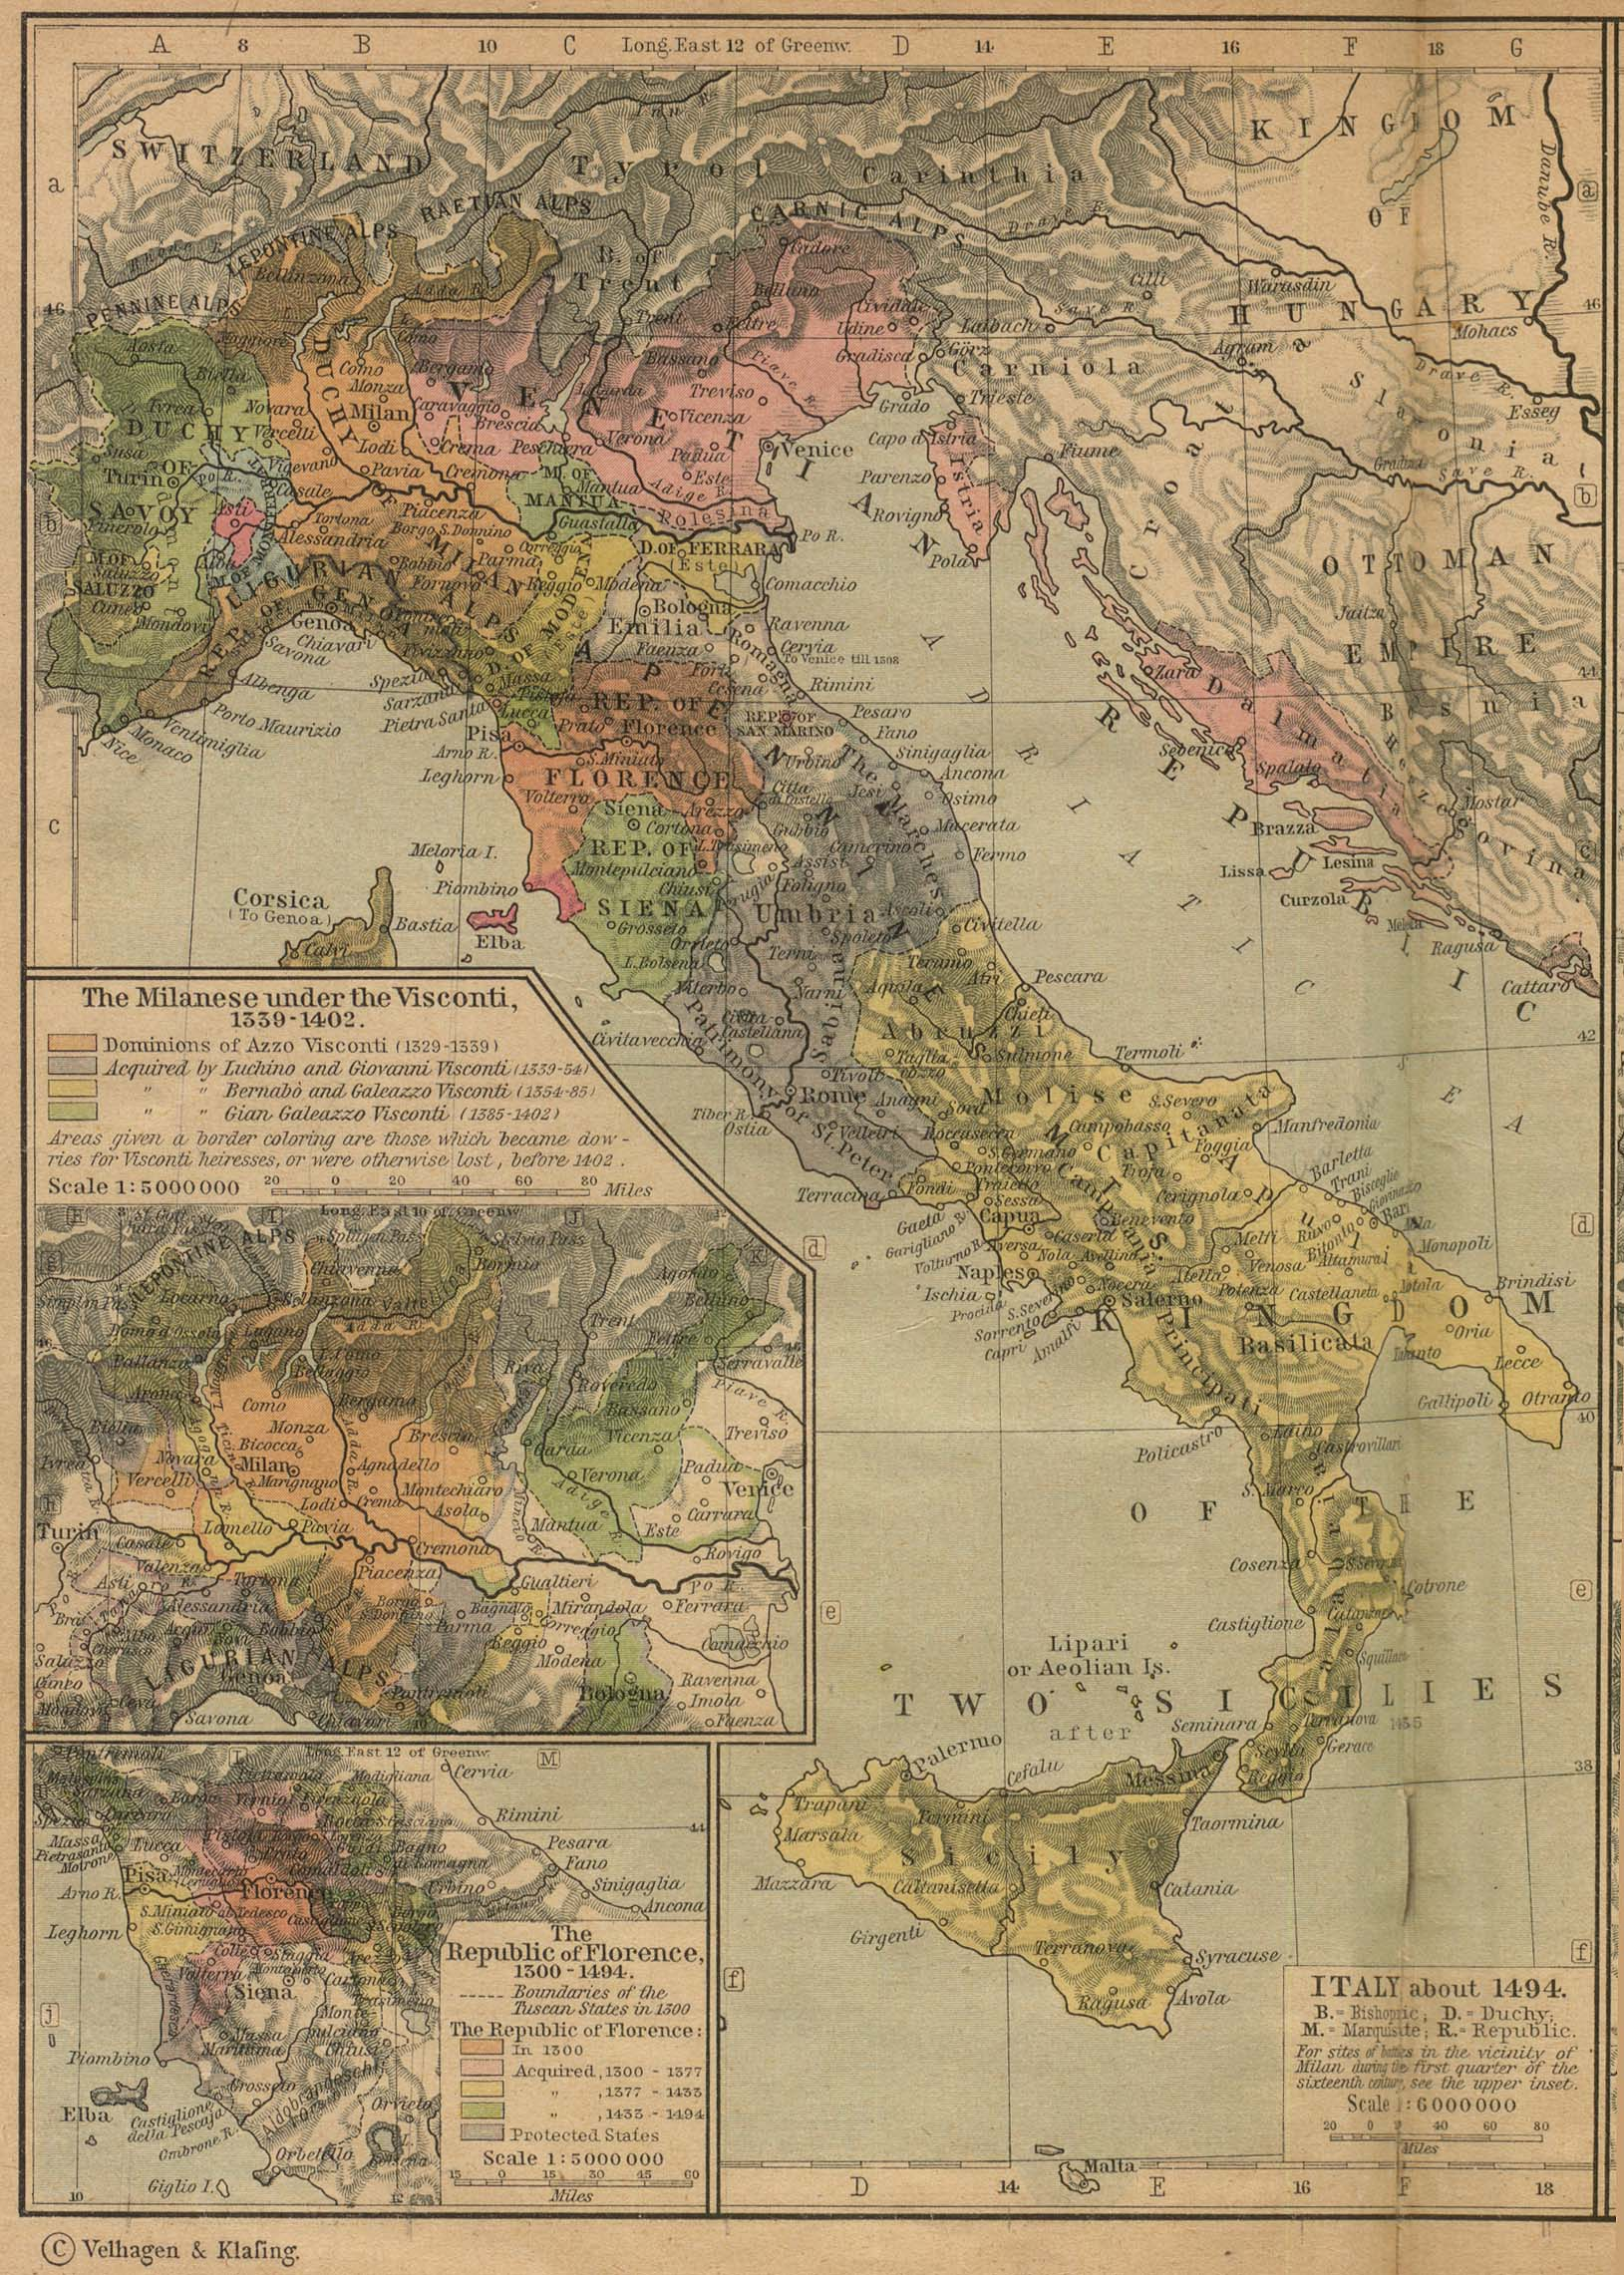 : Italy c.1494, from Shepherd's Historical Atlas 1923, bron www.lib.utexas.edu/maps/historical/shepherd/italy_1494_shepherd.jpg